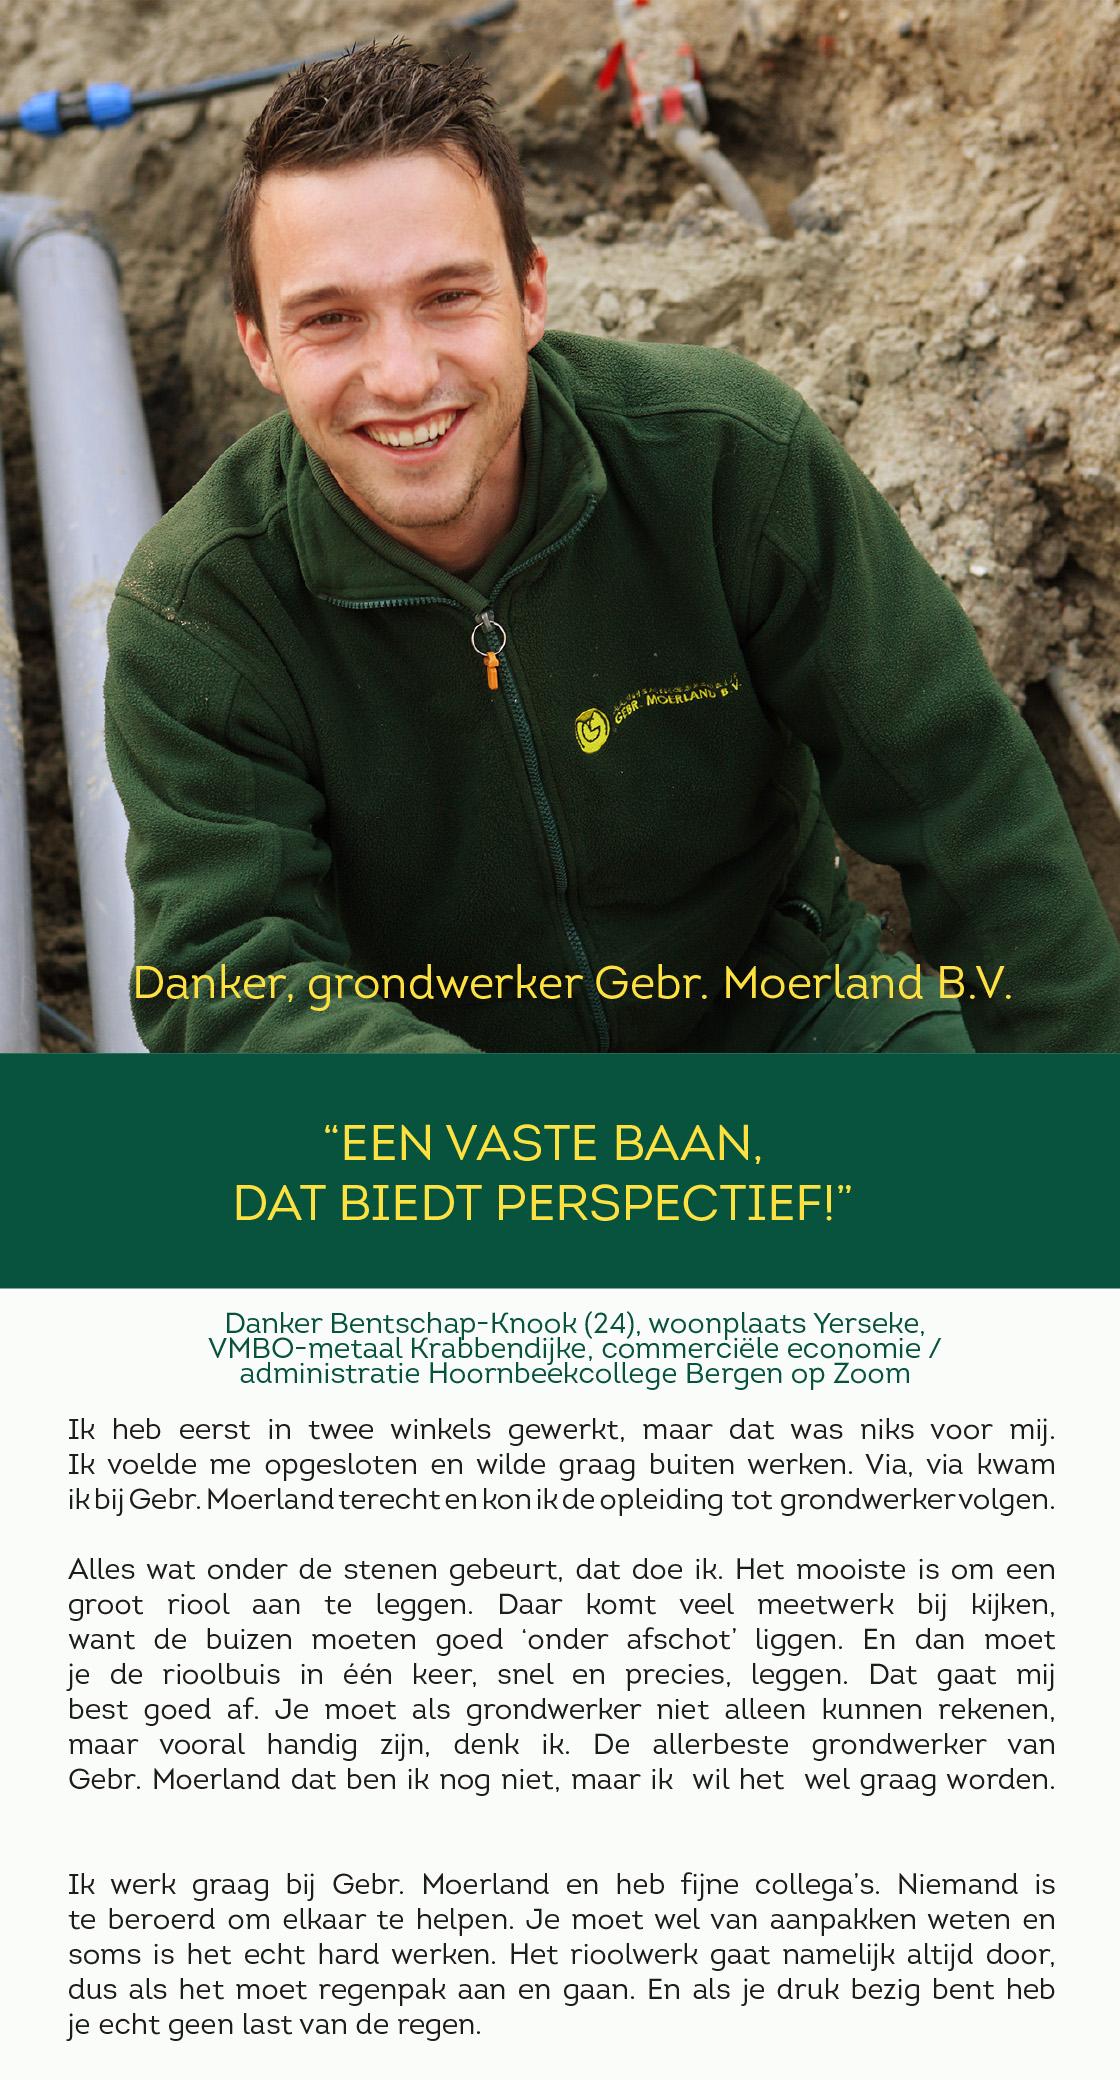 adv-moerland-1-danker